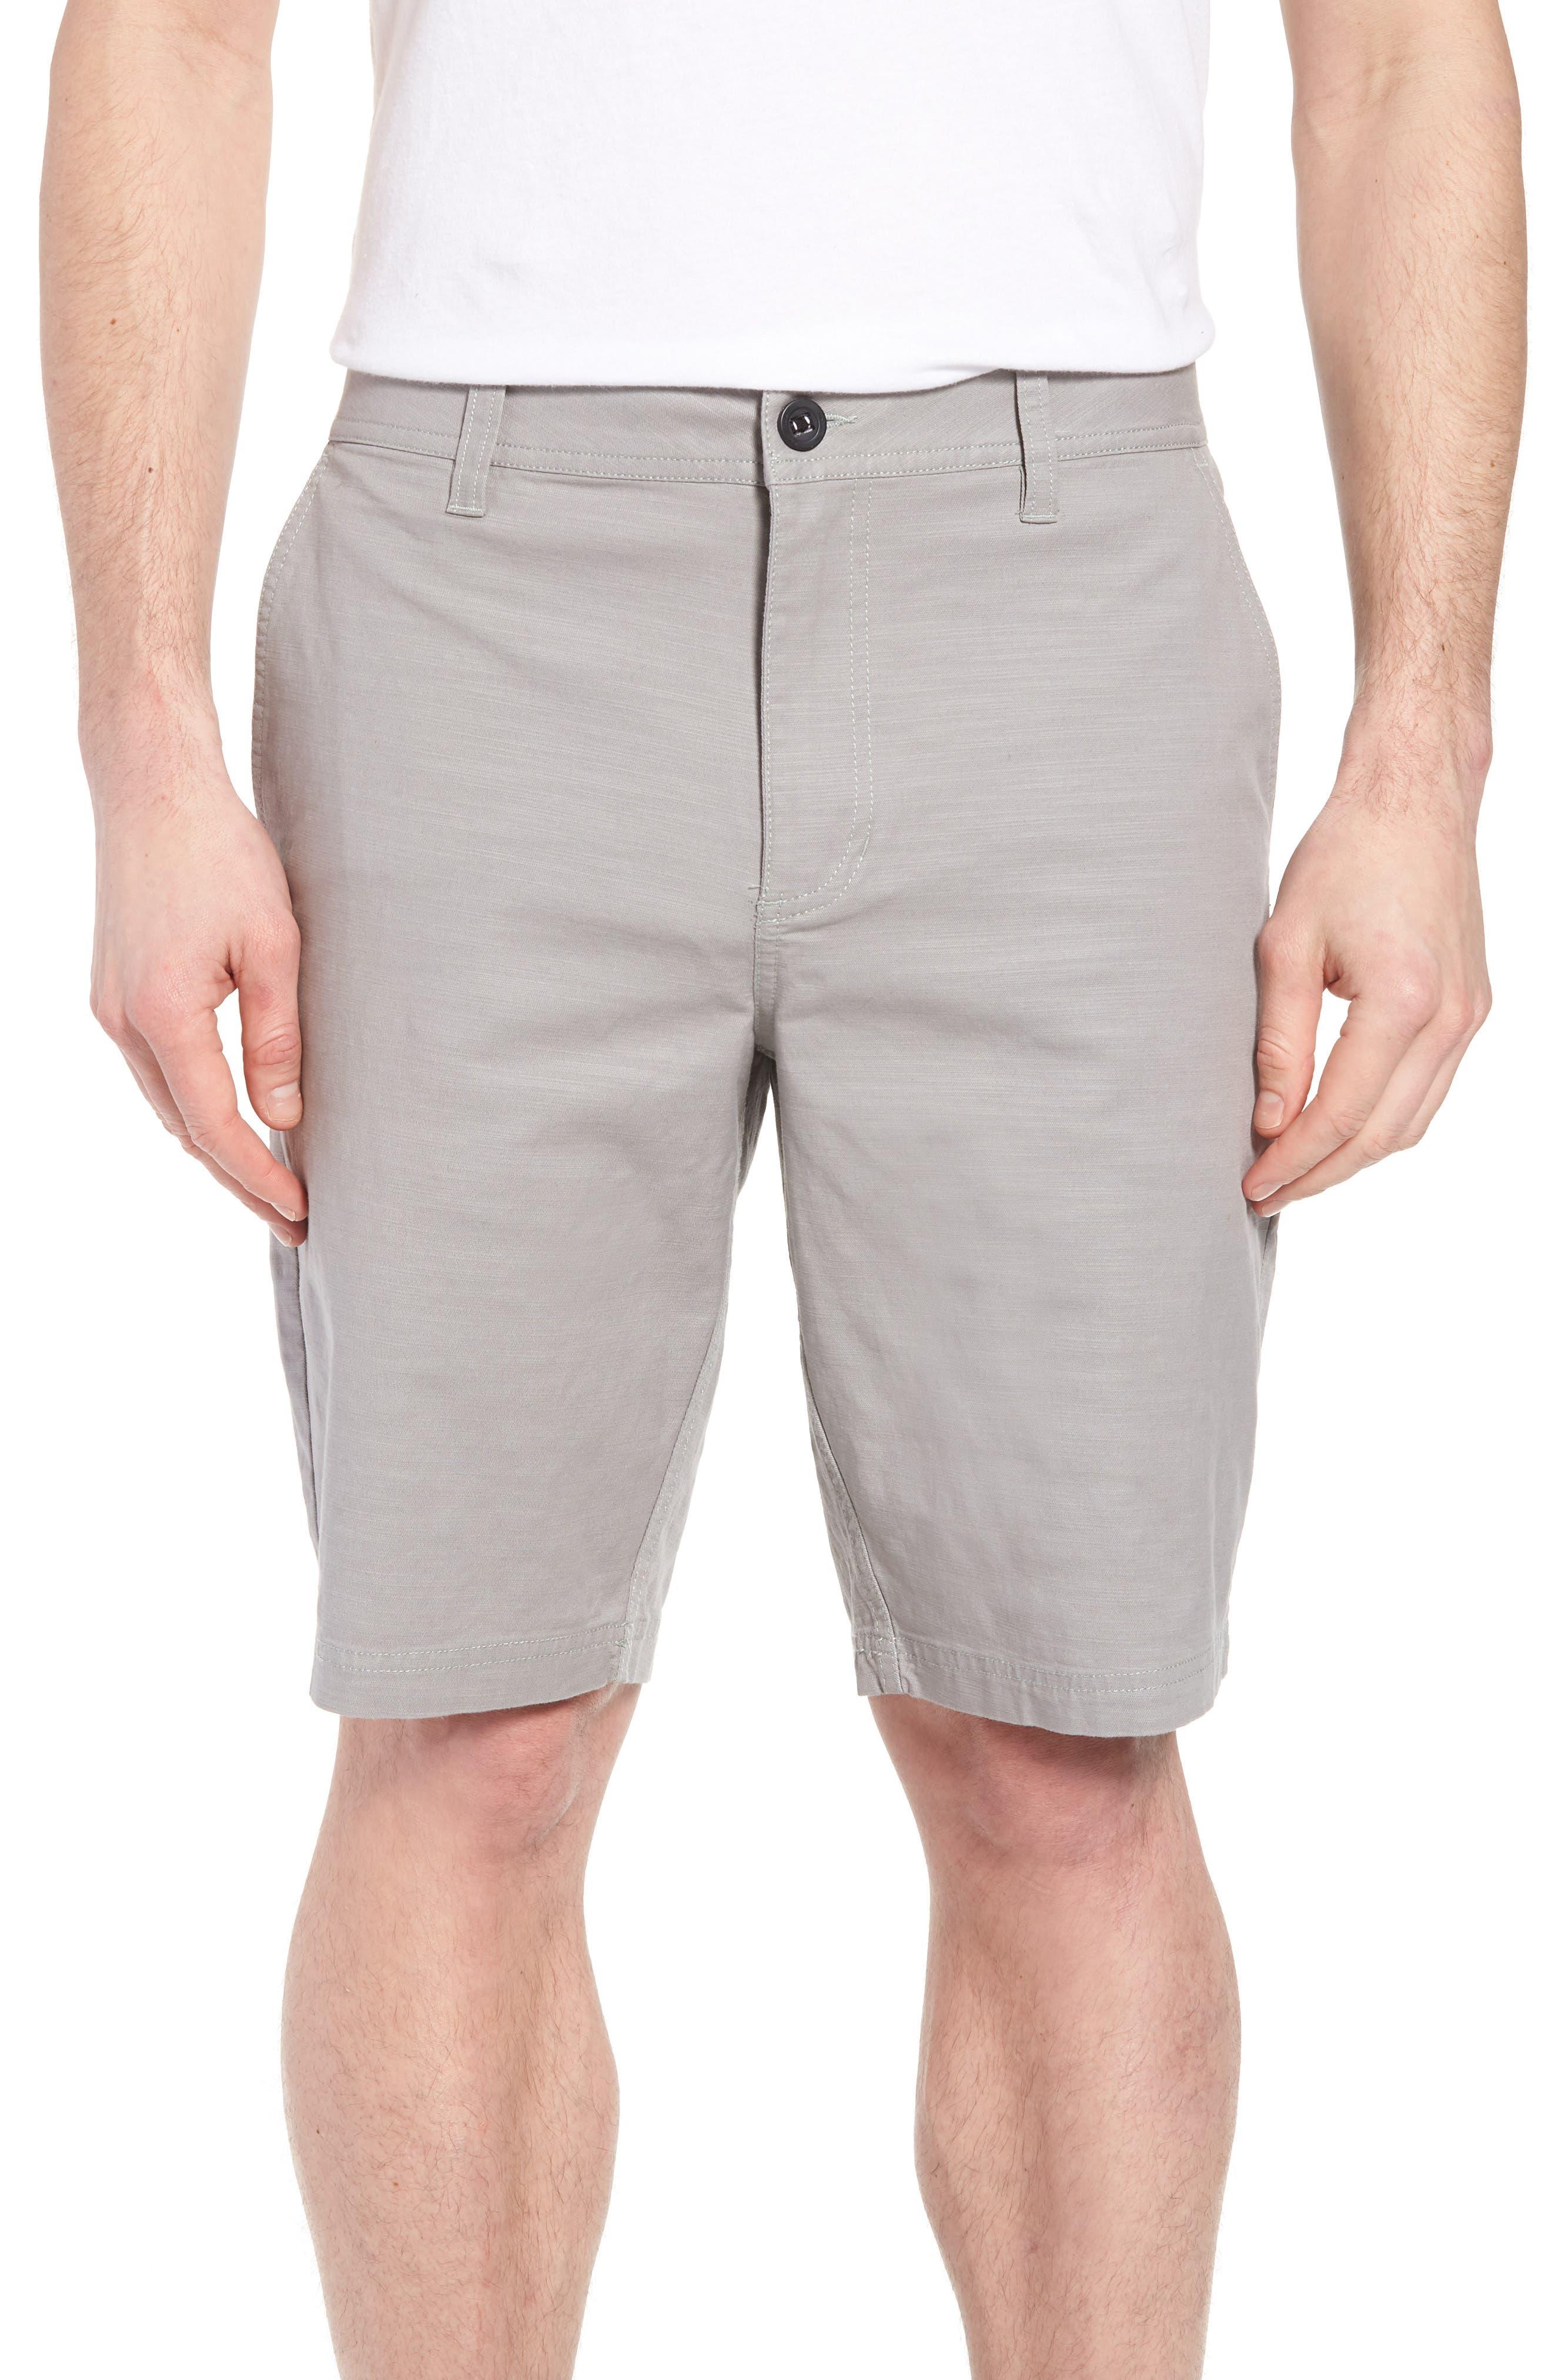 Jay Stretch Chino Shorts,                         Main,                         color, LIGHT GREY